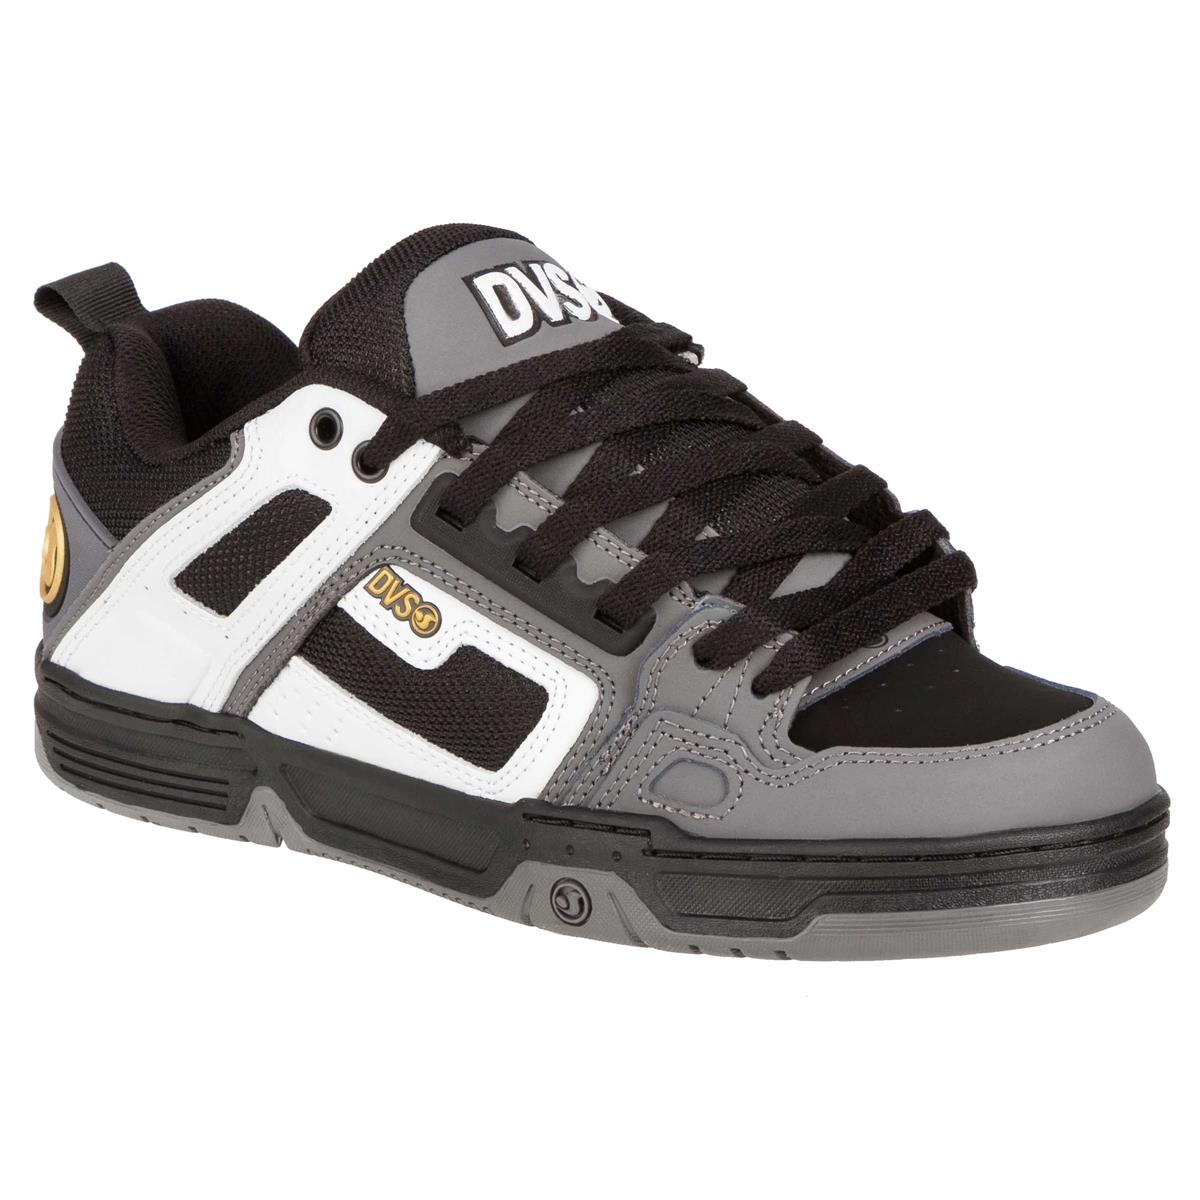 DVS Schuhe Comanche Weiß/Charcoal Nubuk